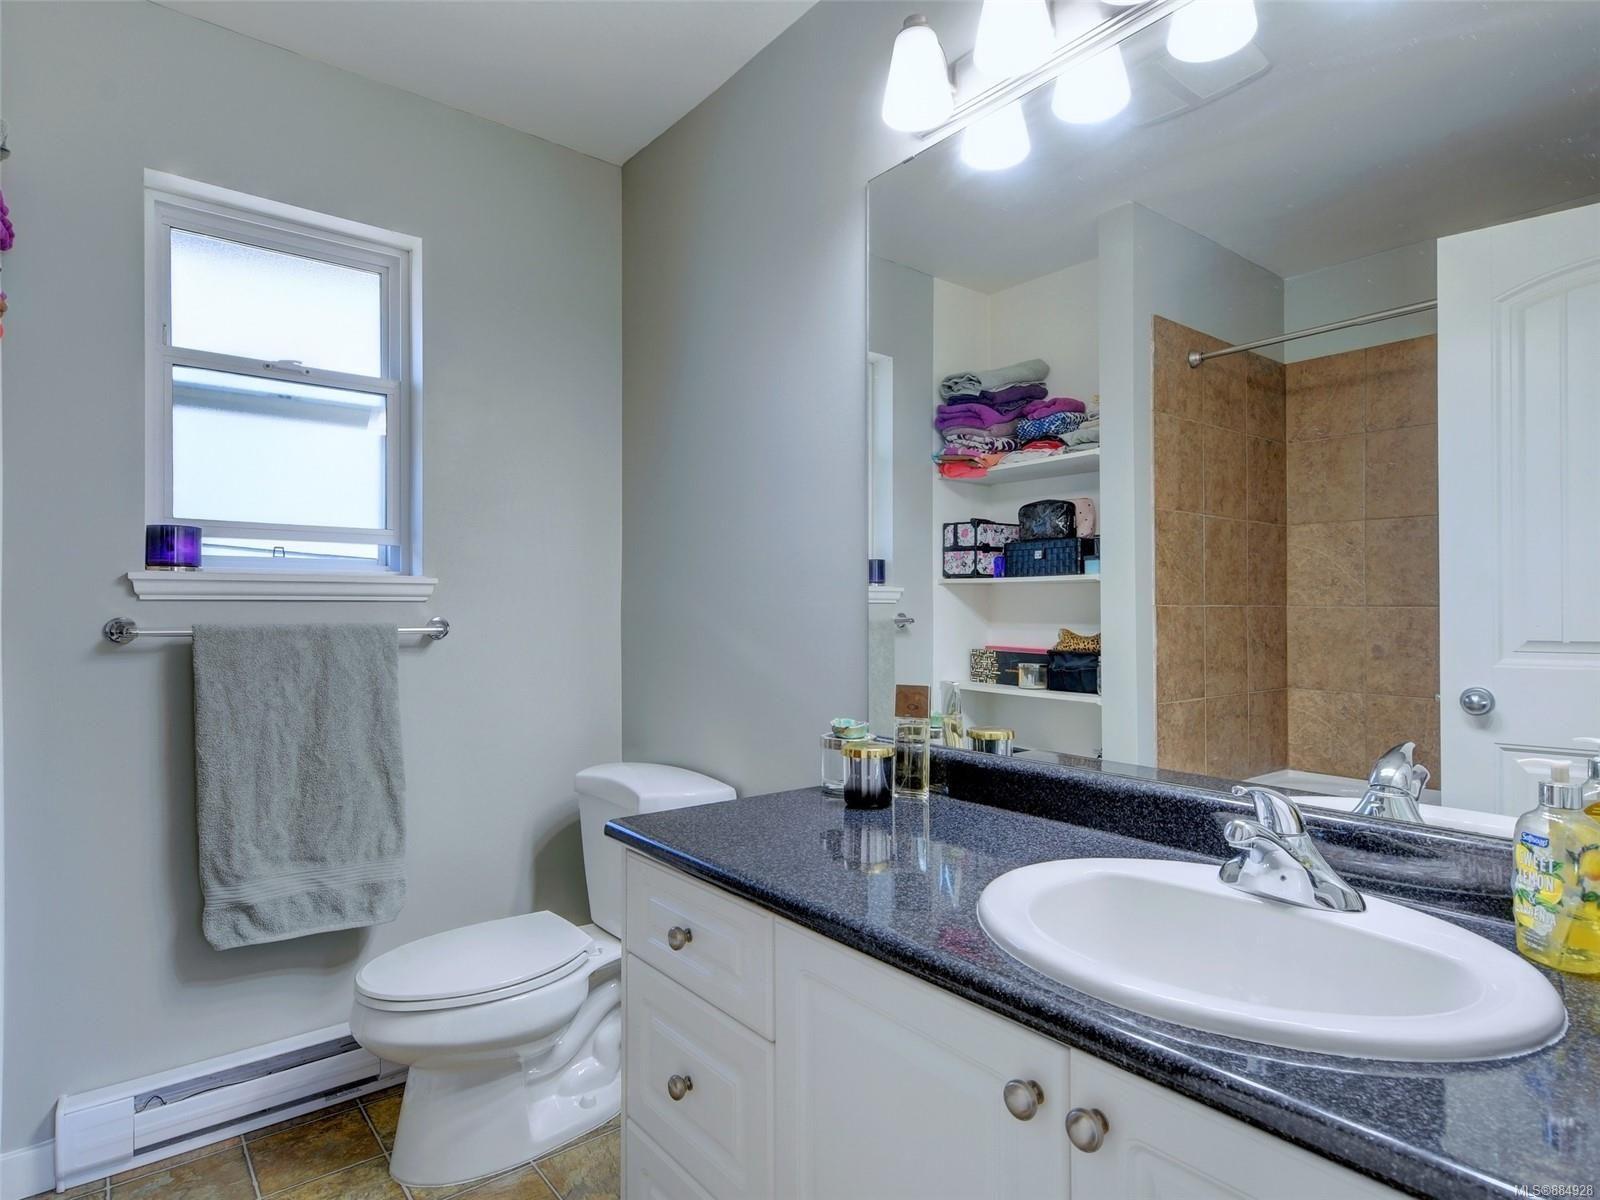 Photo 15: Photos: 6896 Beaton Rd in : Sk Broomhill Half Duplex for sale (Sooke)  : MLS®# 884928